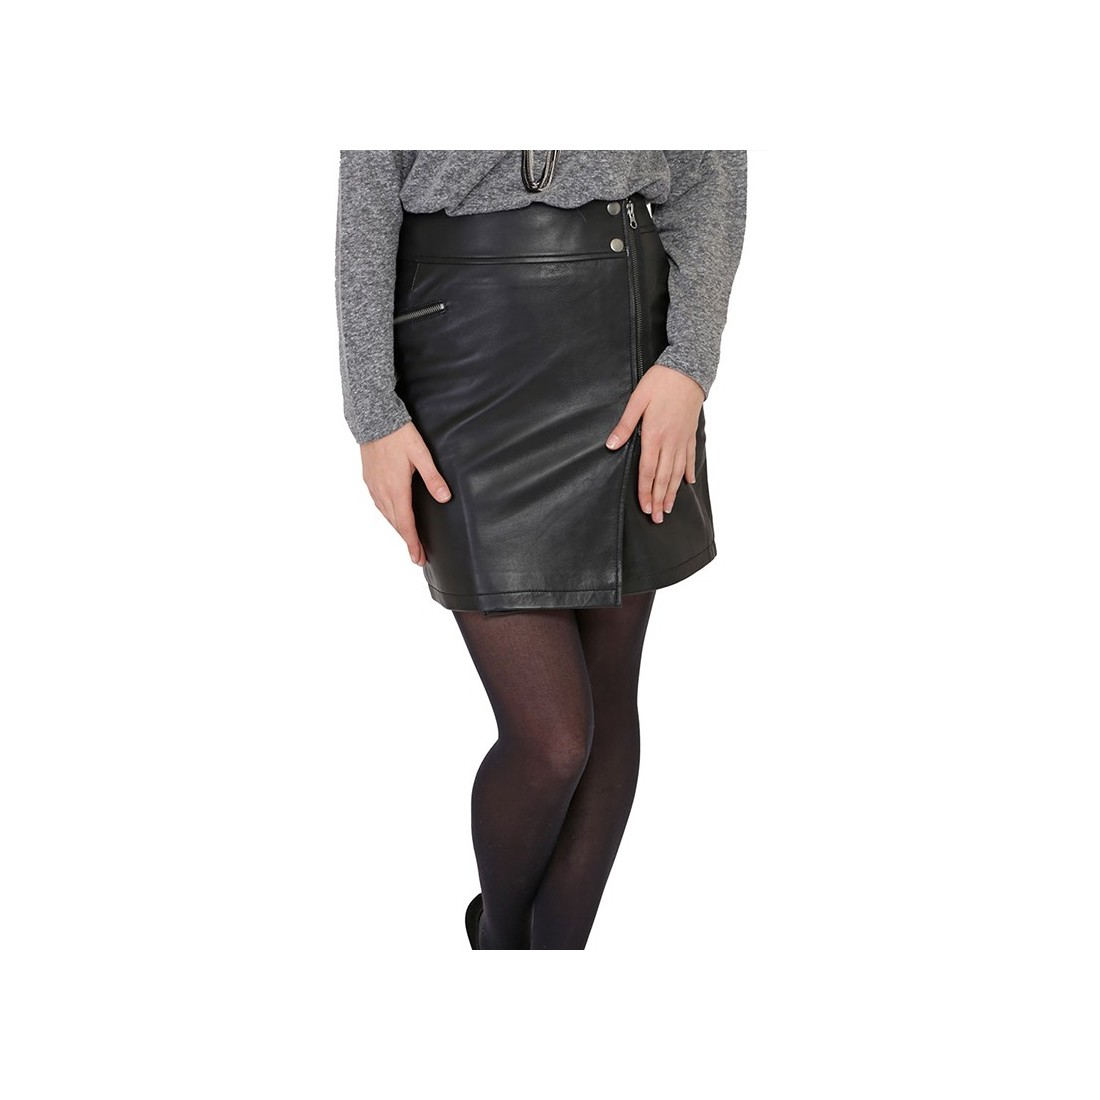 jupe giulietta de giovanni en cuir femme noir. Black Bedroom Furniture Sets. Home Design Ideas